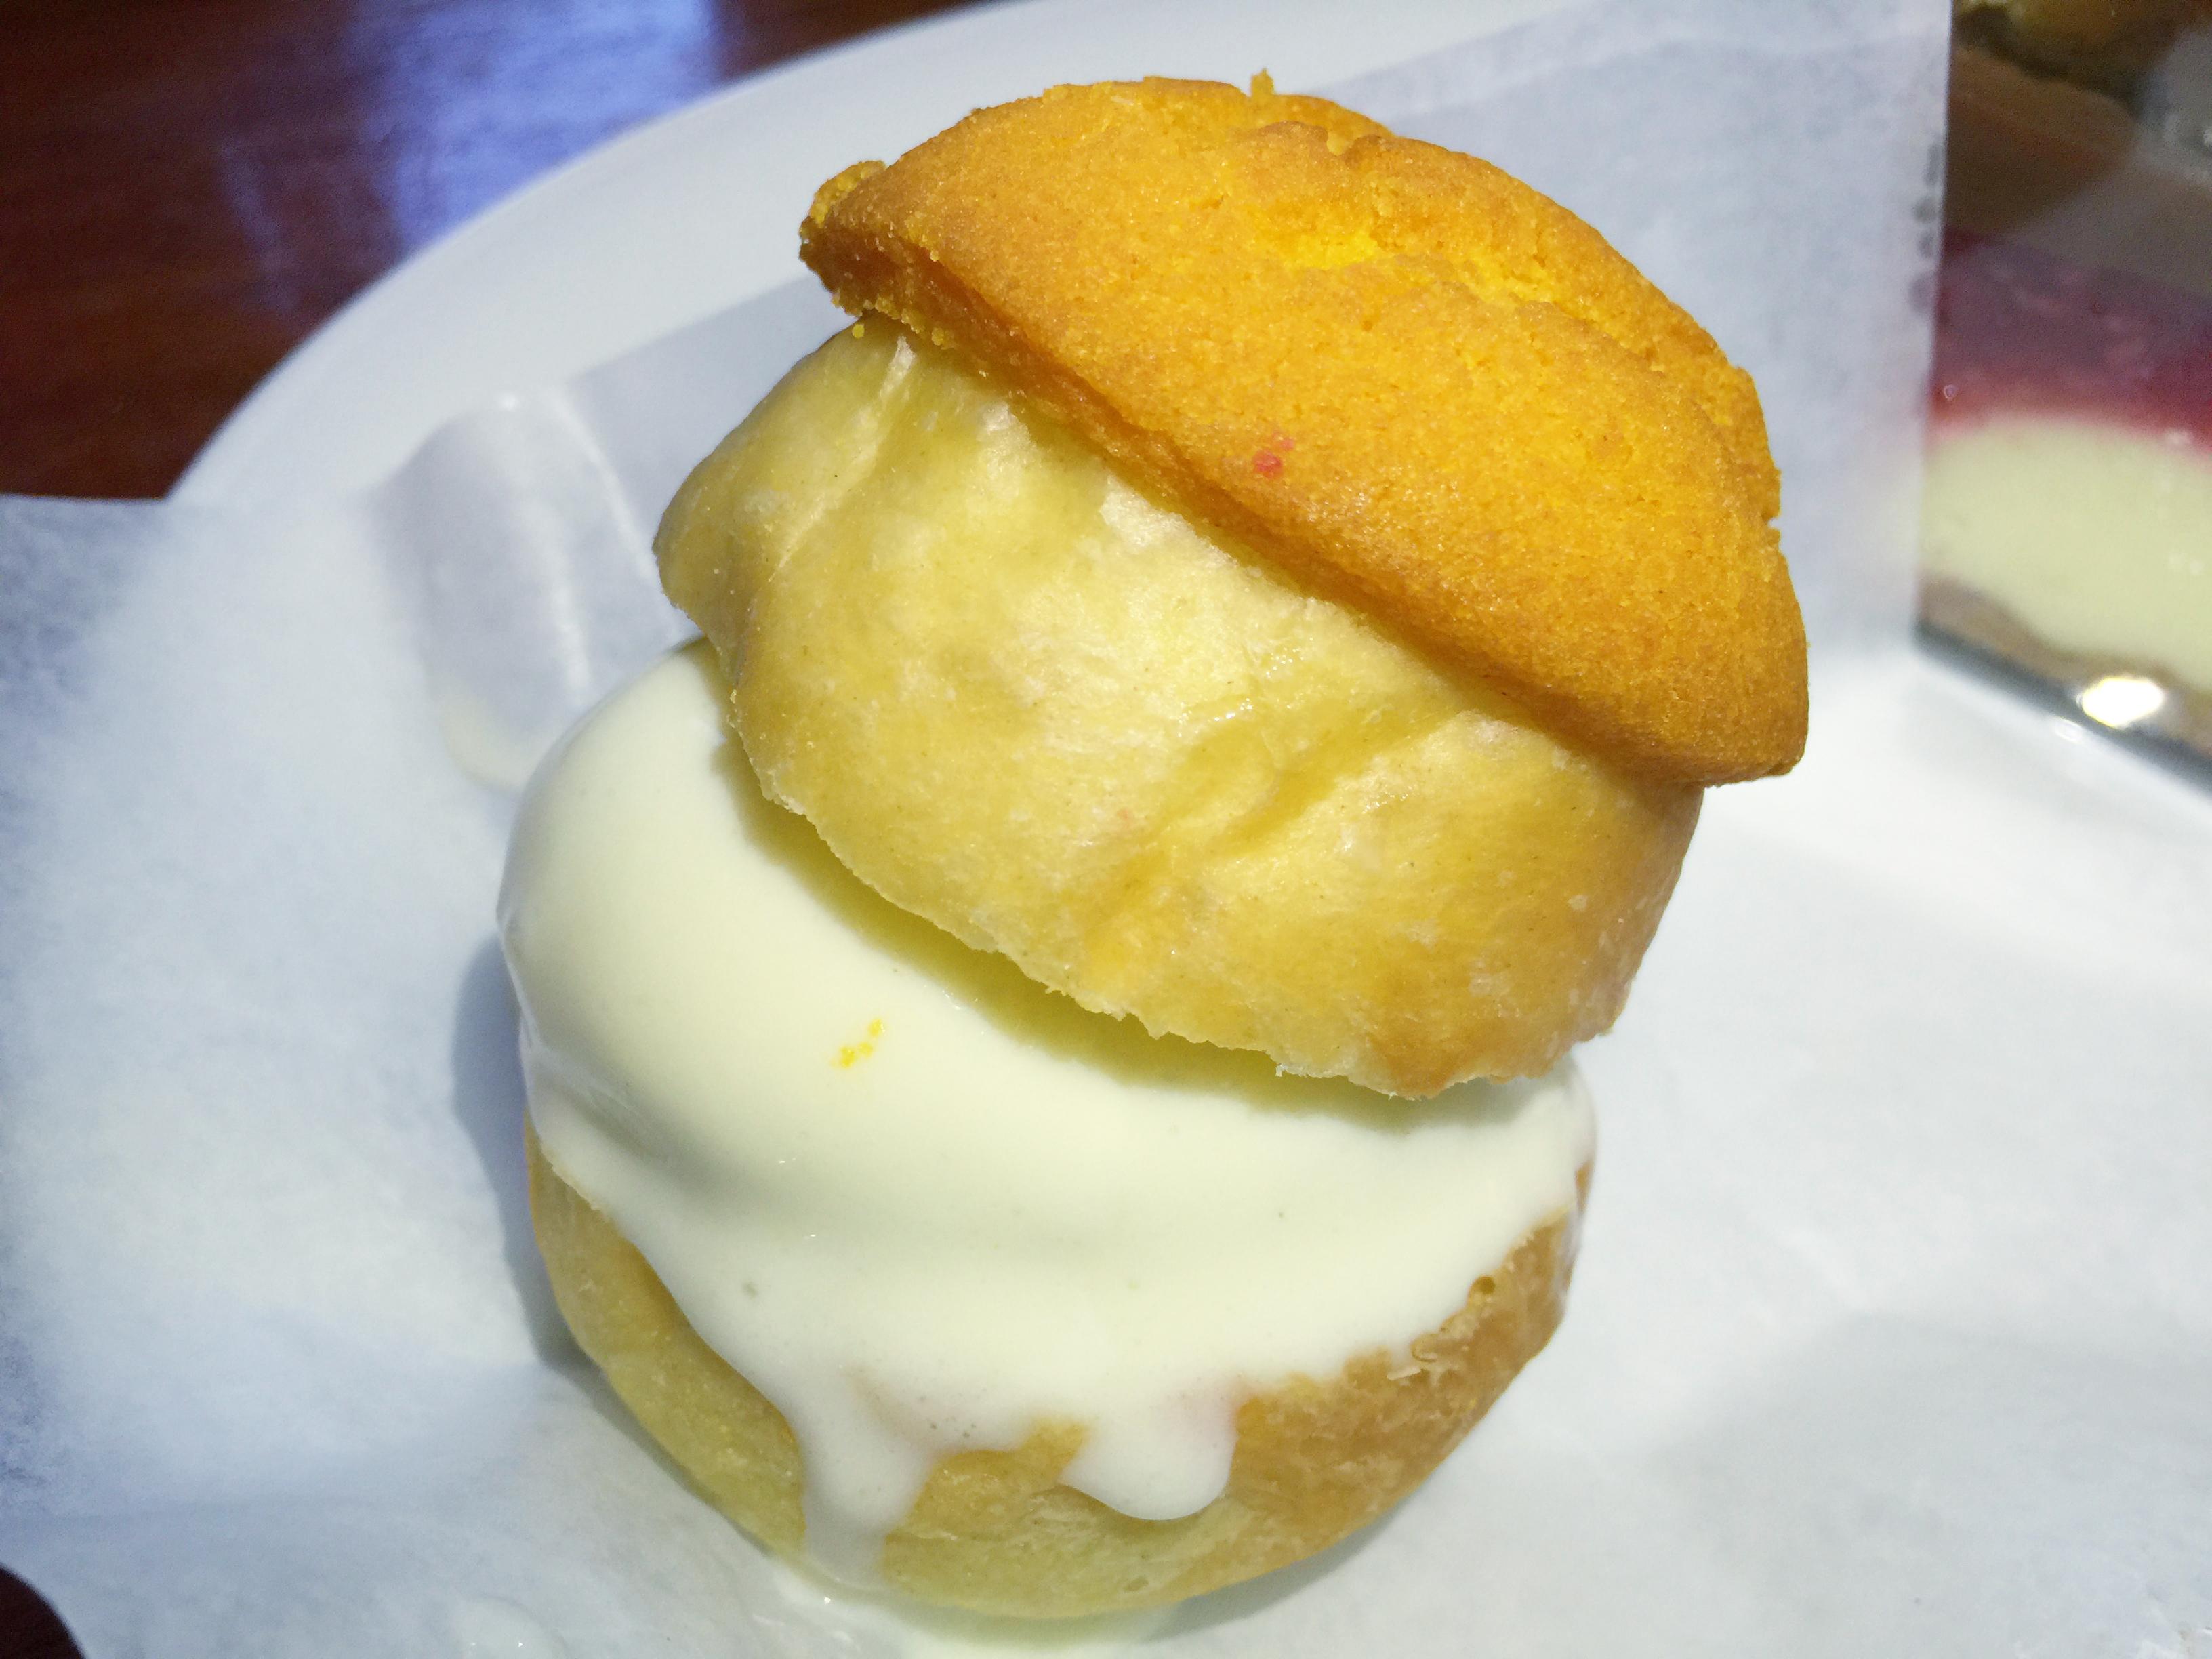 The Dutch Miami pastry puff with coconut ice cream